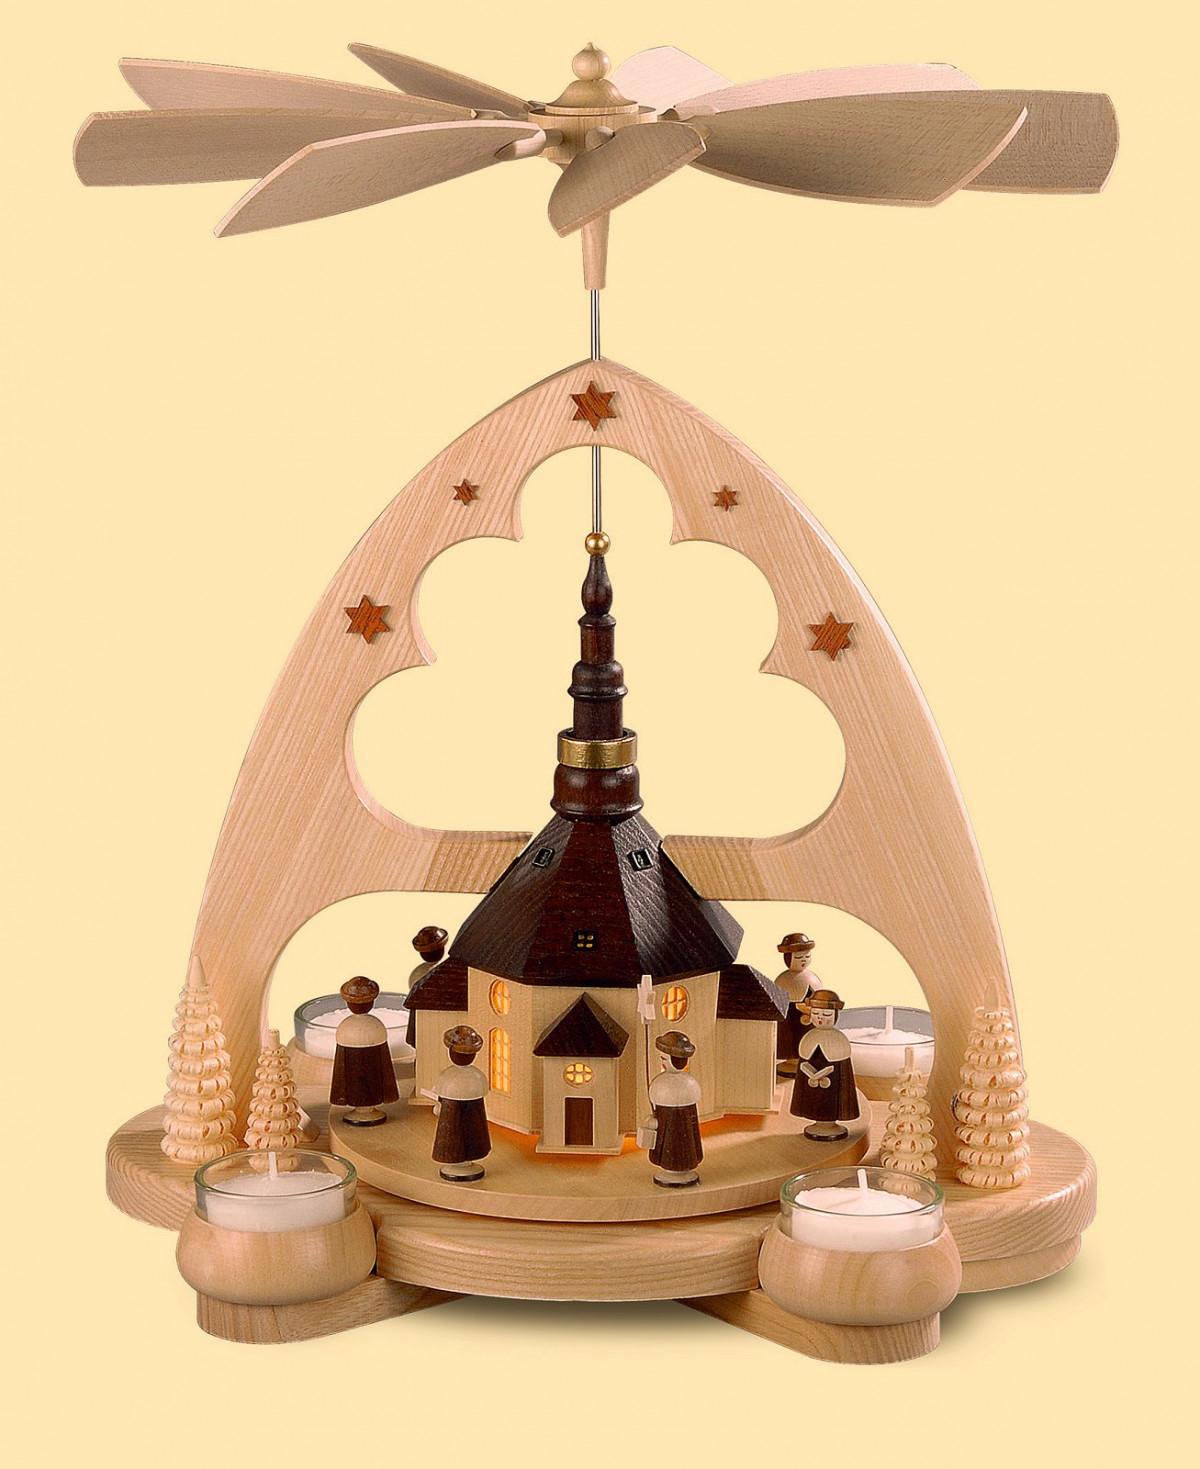 teelicht bogenpyramide seiffener kirche mit led beleuchtung erzgebirgskunst drechsel. Black Bedroom Furniture Sets. Home Design Ideas